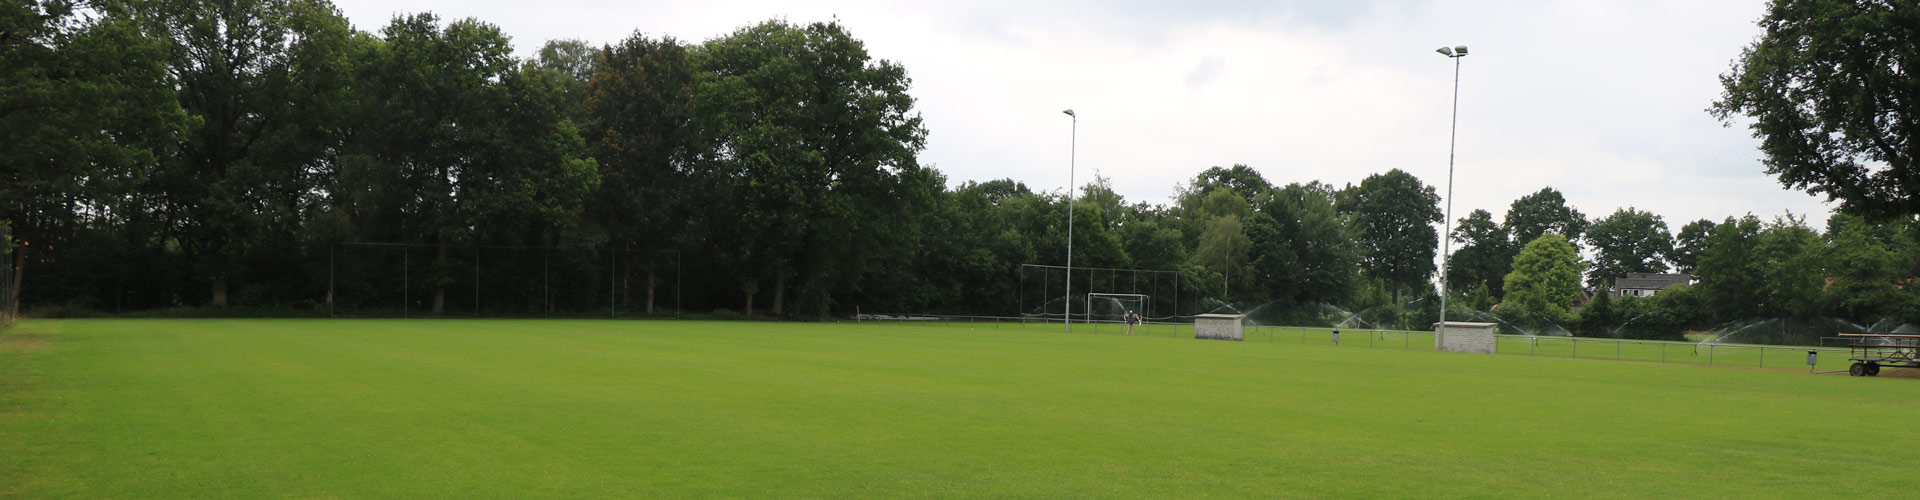 Dorpsaccommodatie Rietmolen - Voetbal trainingsveld